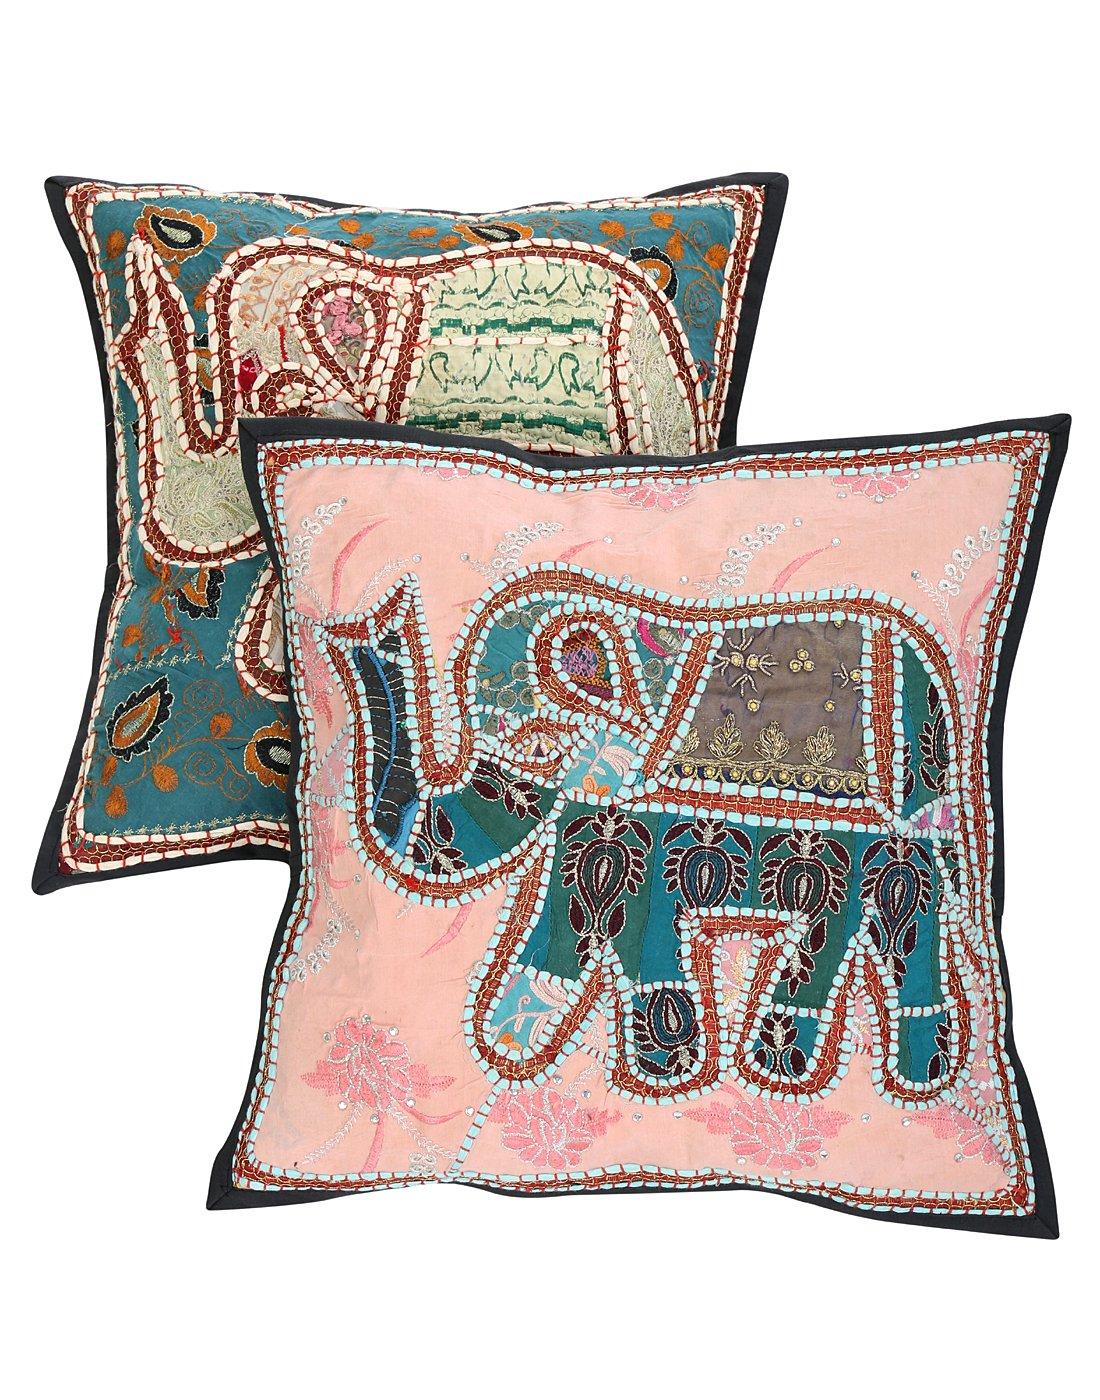 Rajrang Traditioneller Kissenbezug Elefant Handarbeit Baumwolle blau Baumwolle Handarbeit Kissenbezug 2 St. 55676d